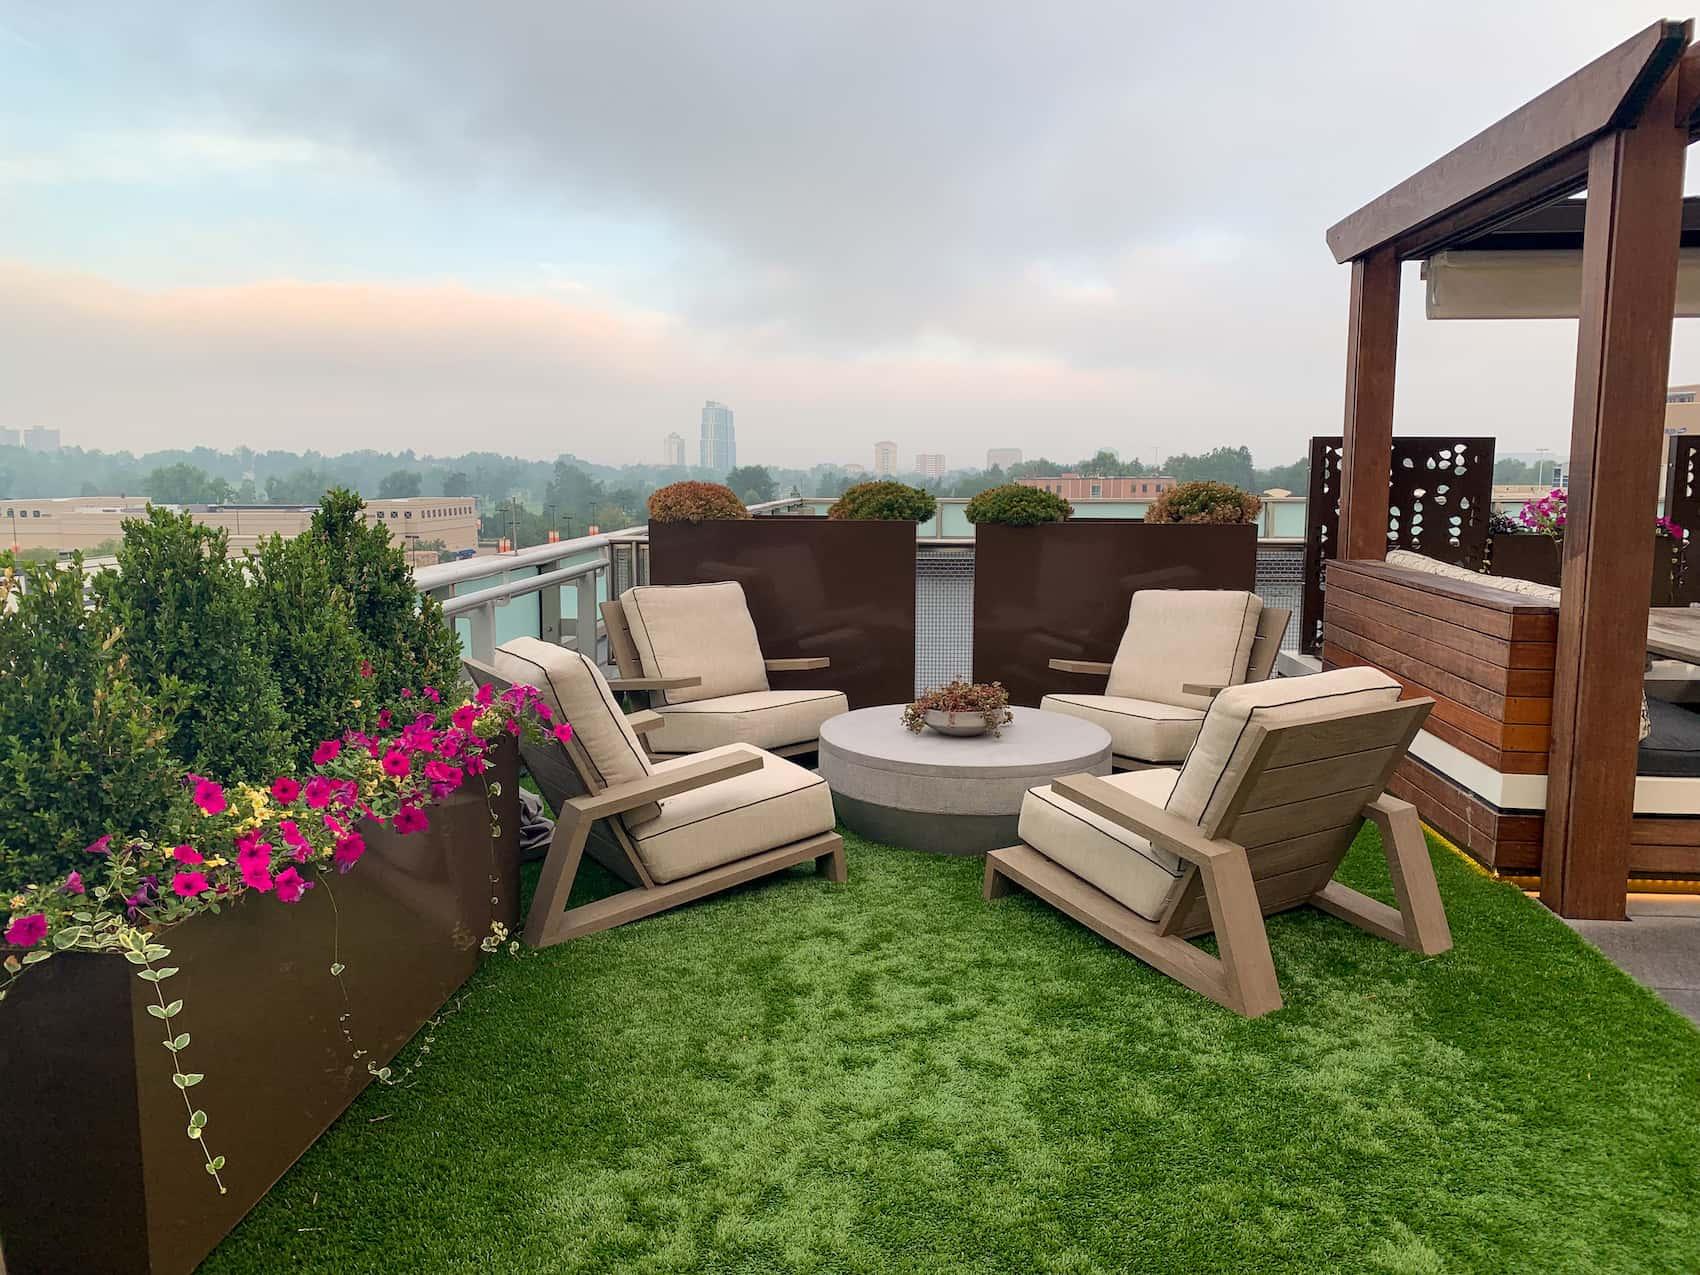 Artificial Turf Rooftop Deck Built-In Planters Cherry Creek Denver CO